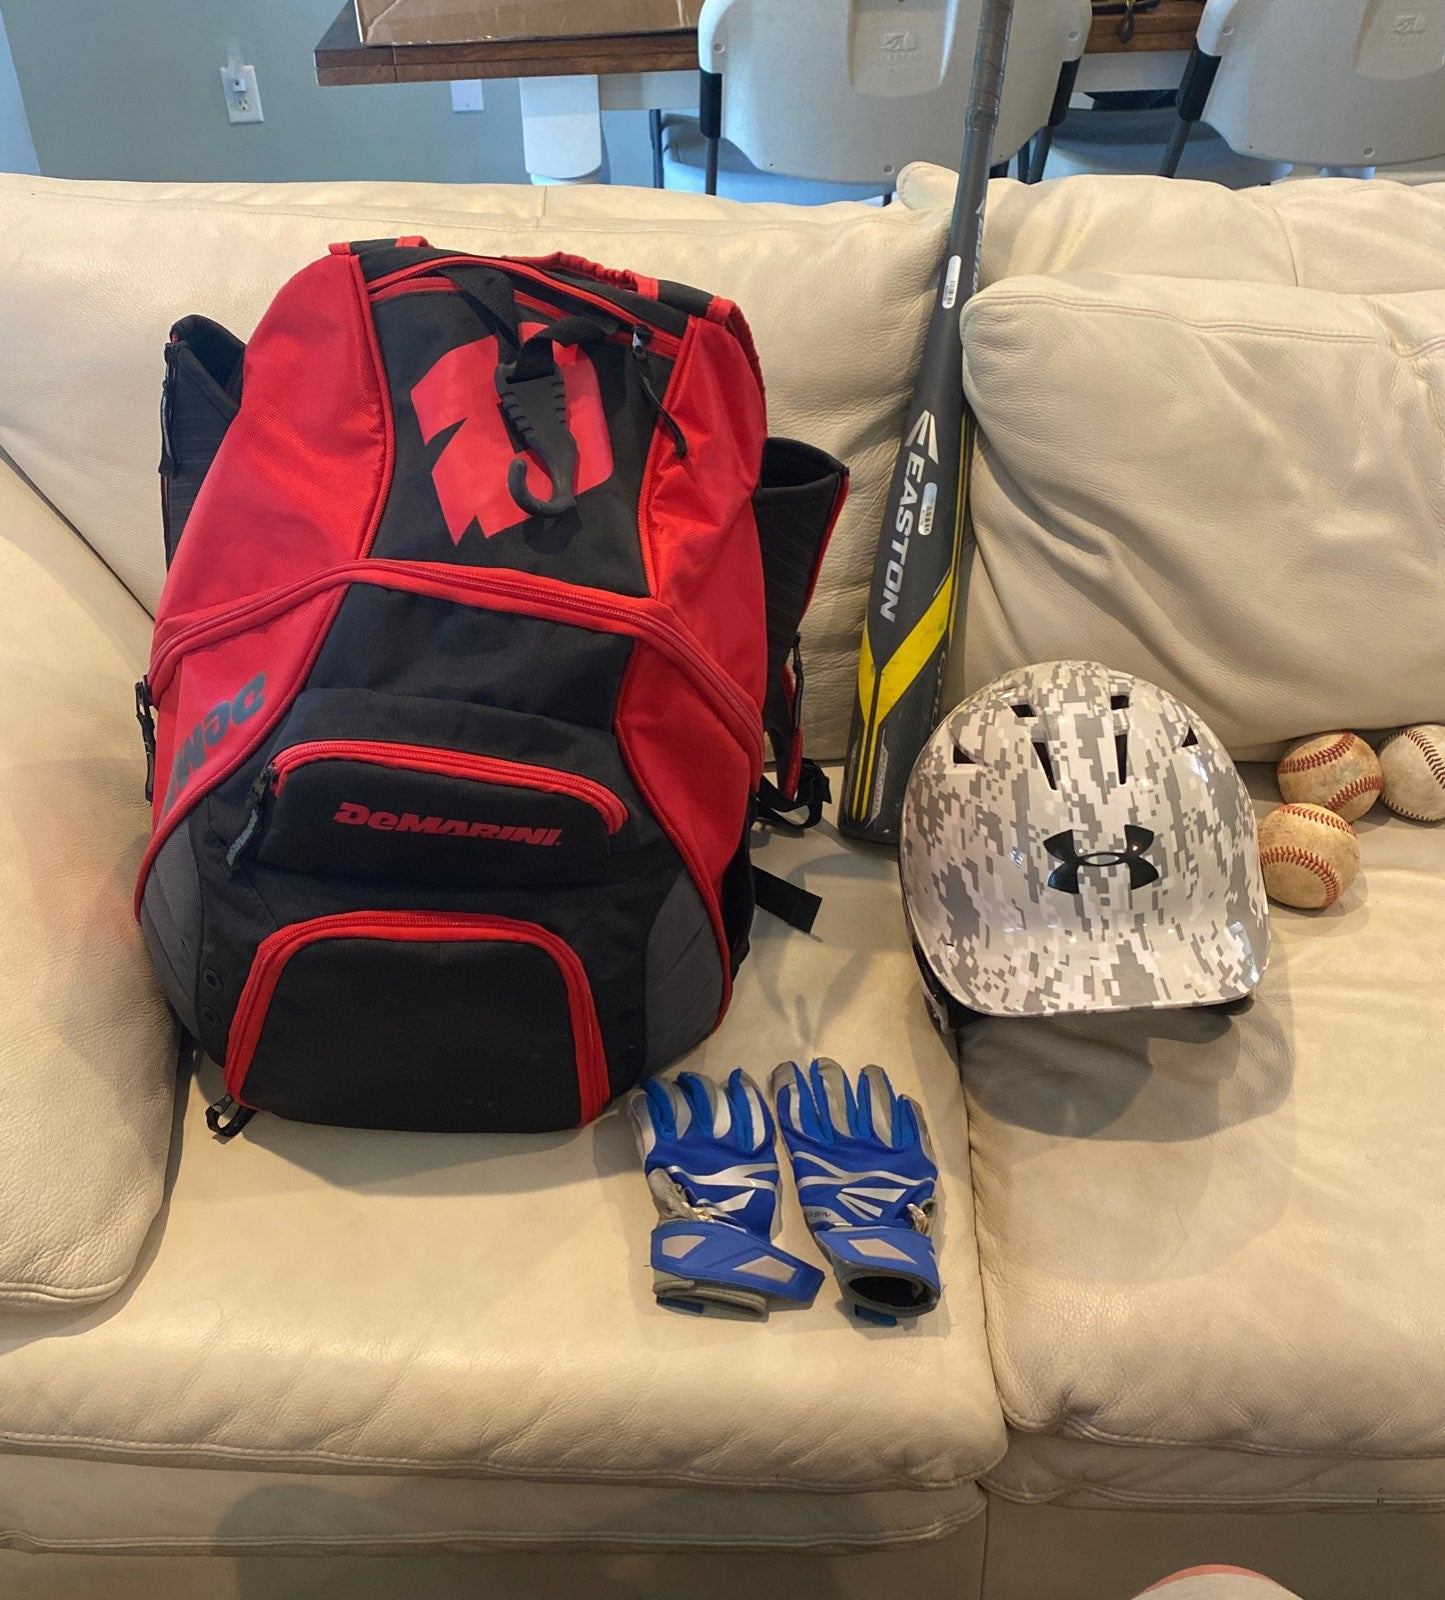 Baseball equiptment